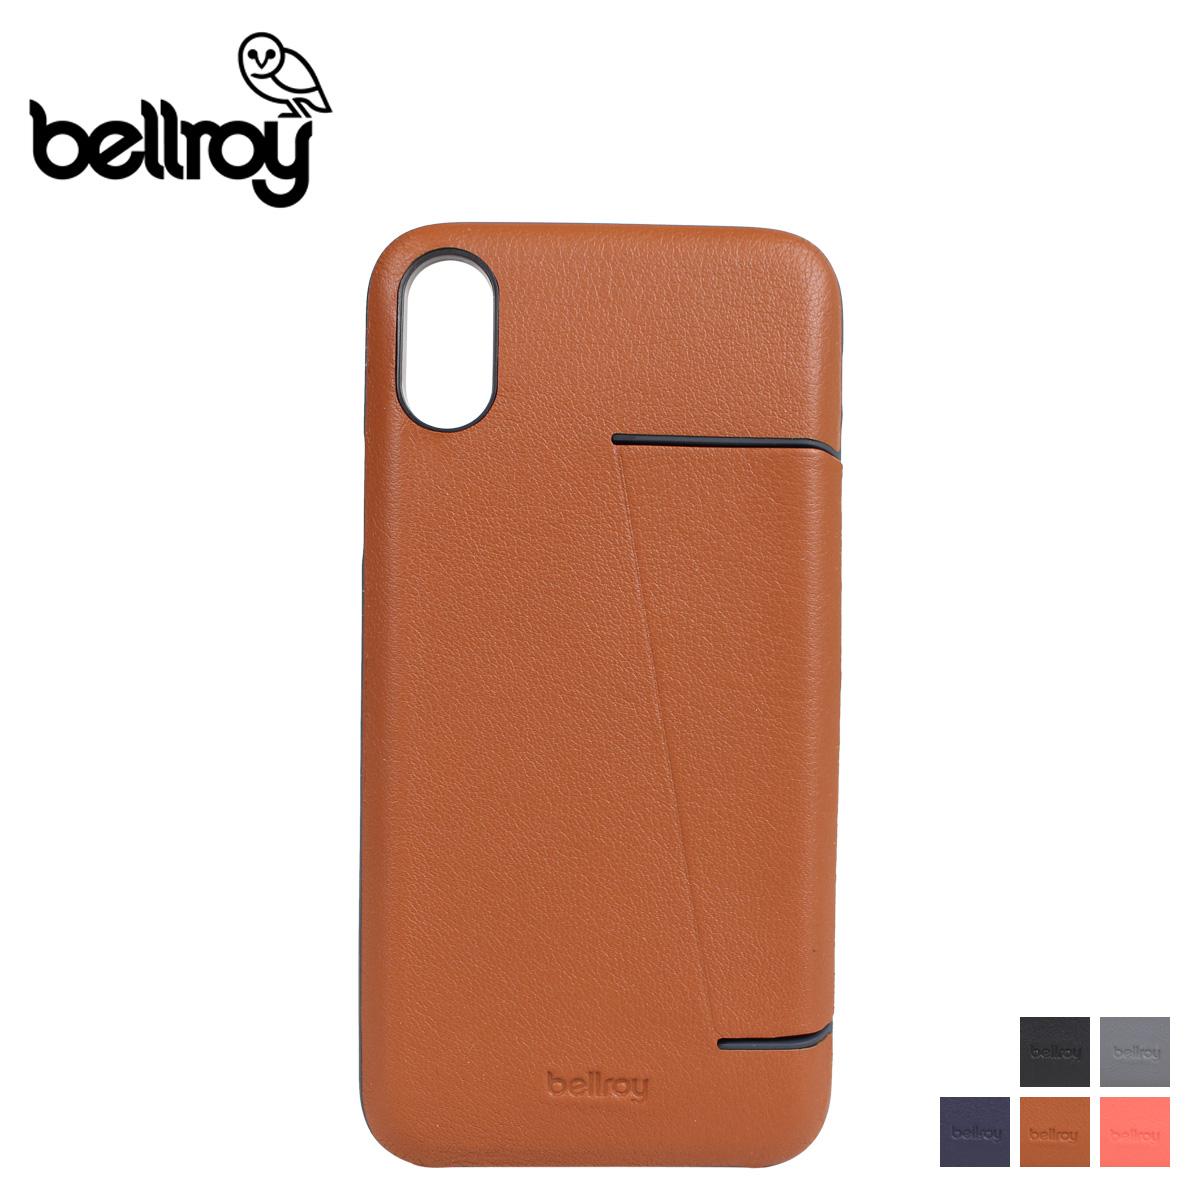 pretty nice 7aa2a 0fac4 Bellroy PHONE CASE 3 CARD bell Roy iPhoneX XS case smartphone eyephone men  gap Dis leather PTXA [5/1 Shinnyu load]